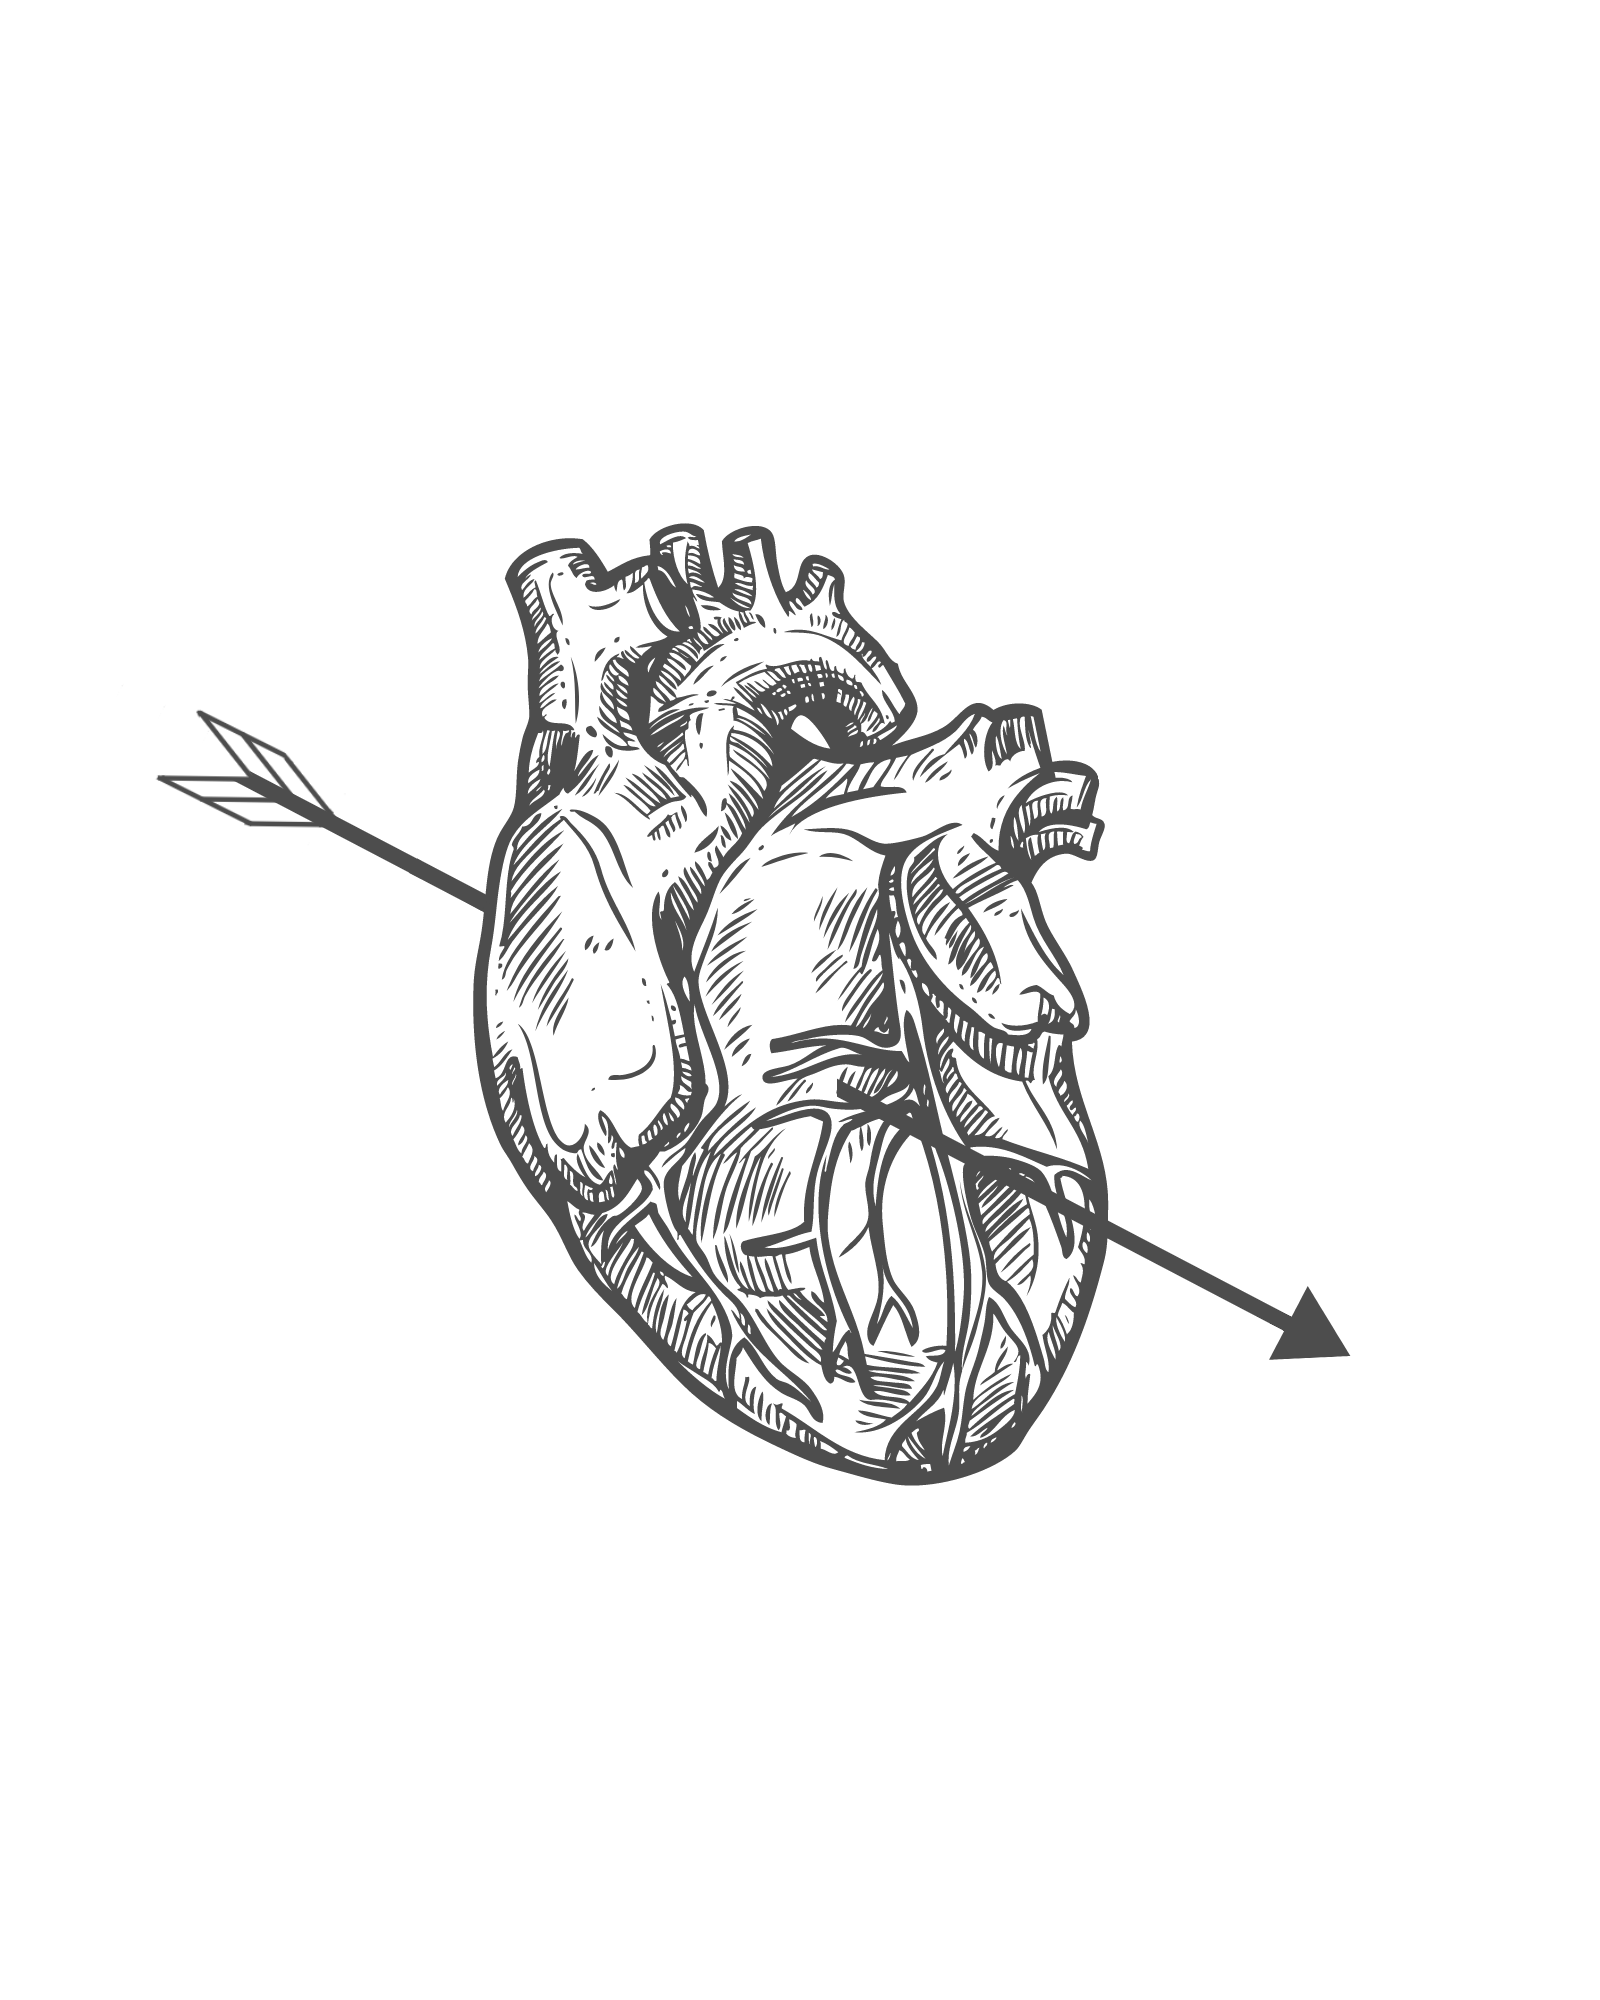 Heart Wall Art Printable Anatomical Heart Art Black And White Prints Heart Wall Art